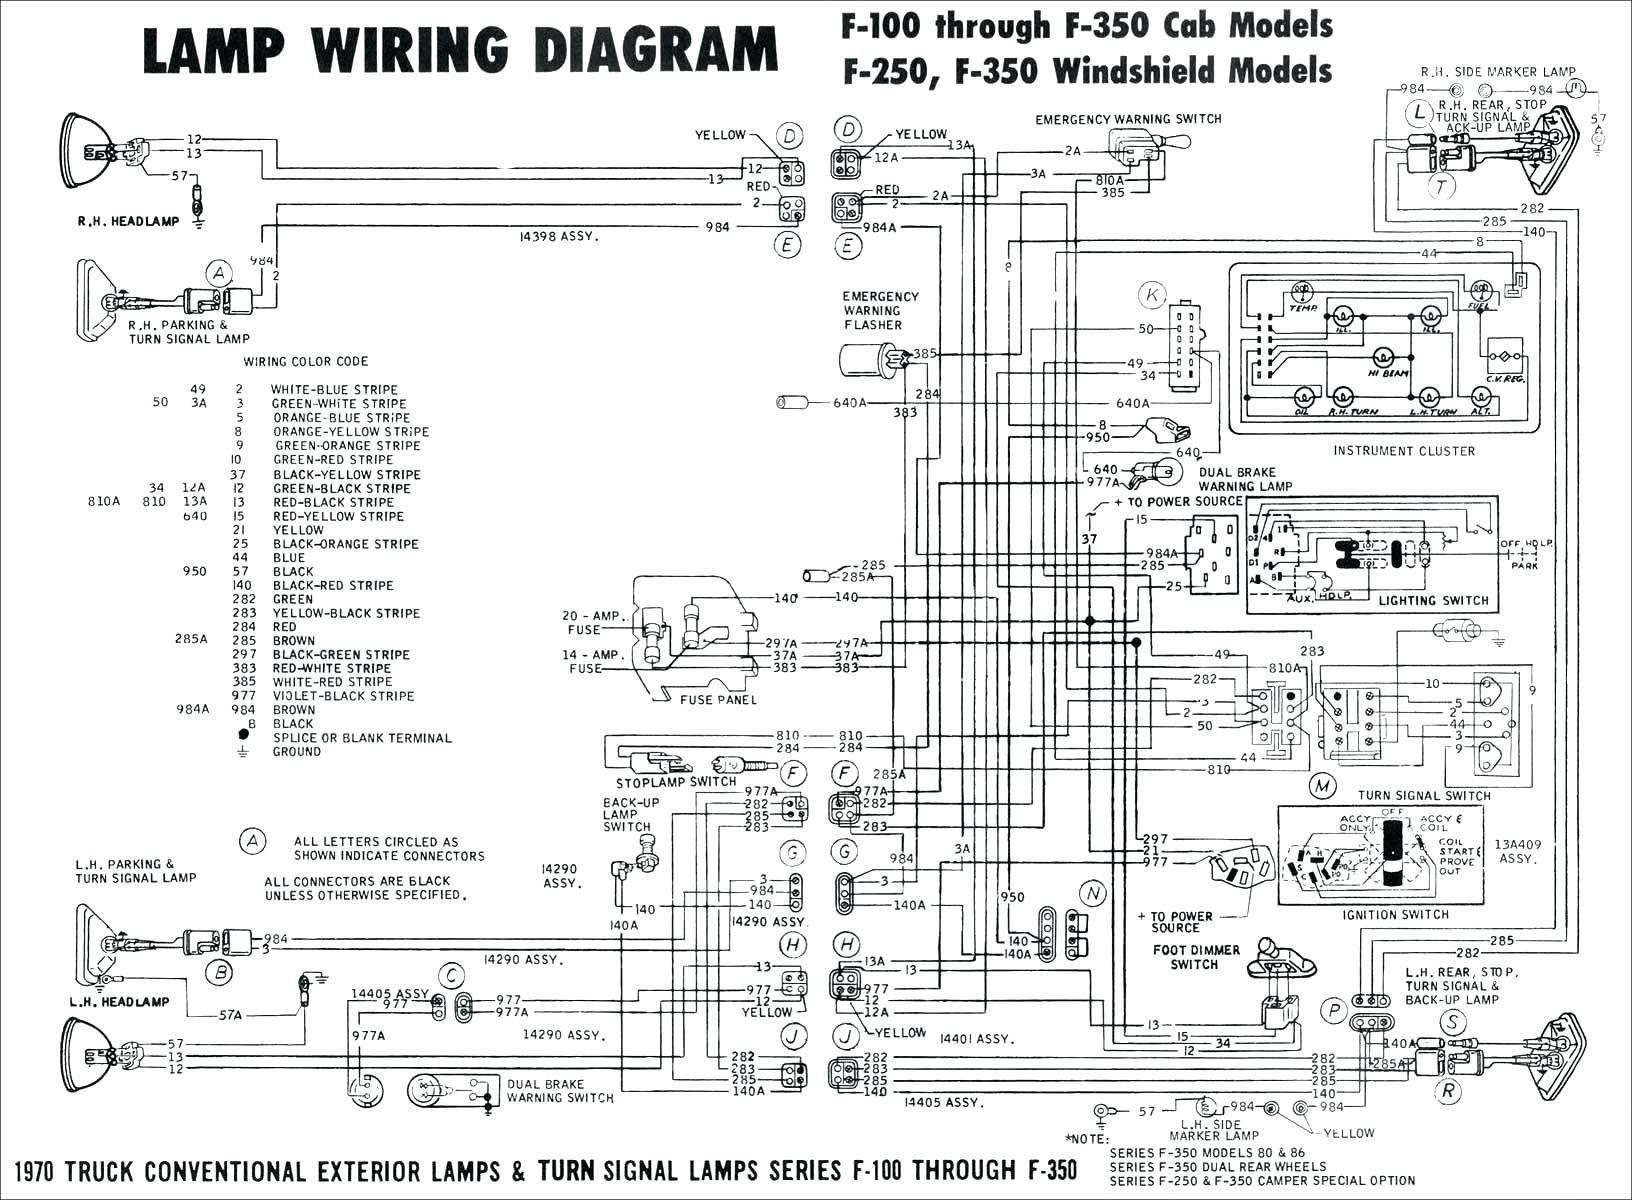 Toyota Camry 2001 Engine Diagram Di 2020 Ford Explorer Nissan Maxima Stratus